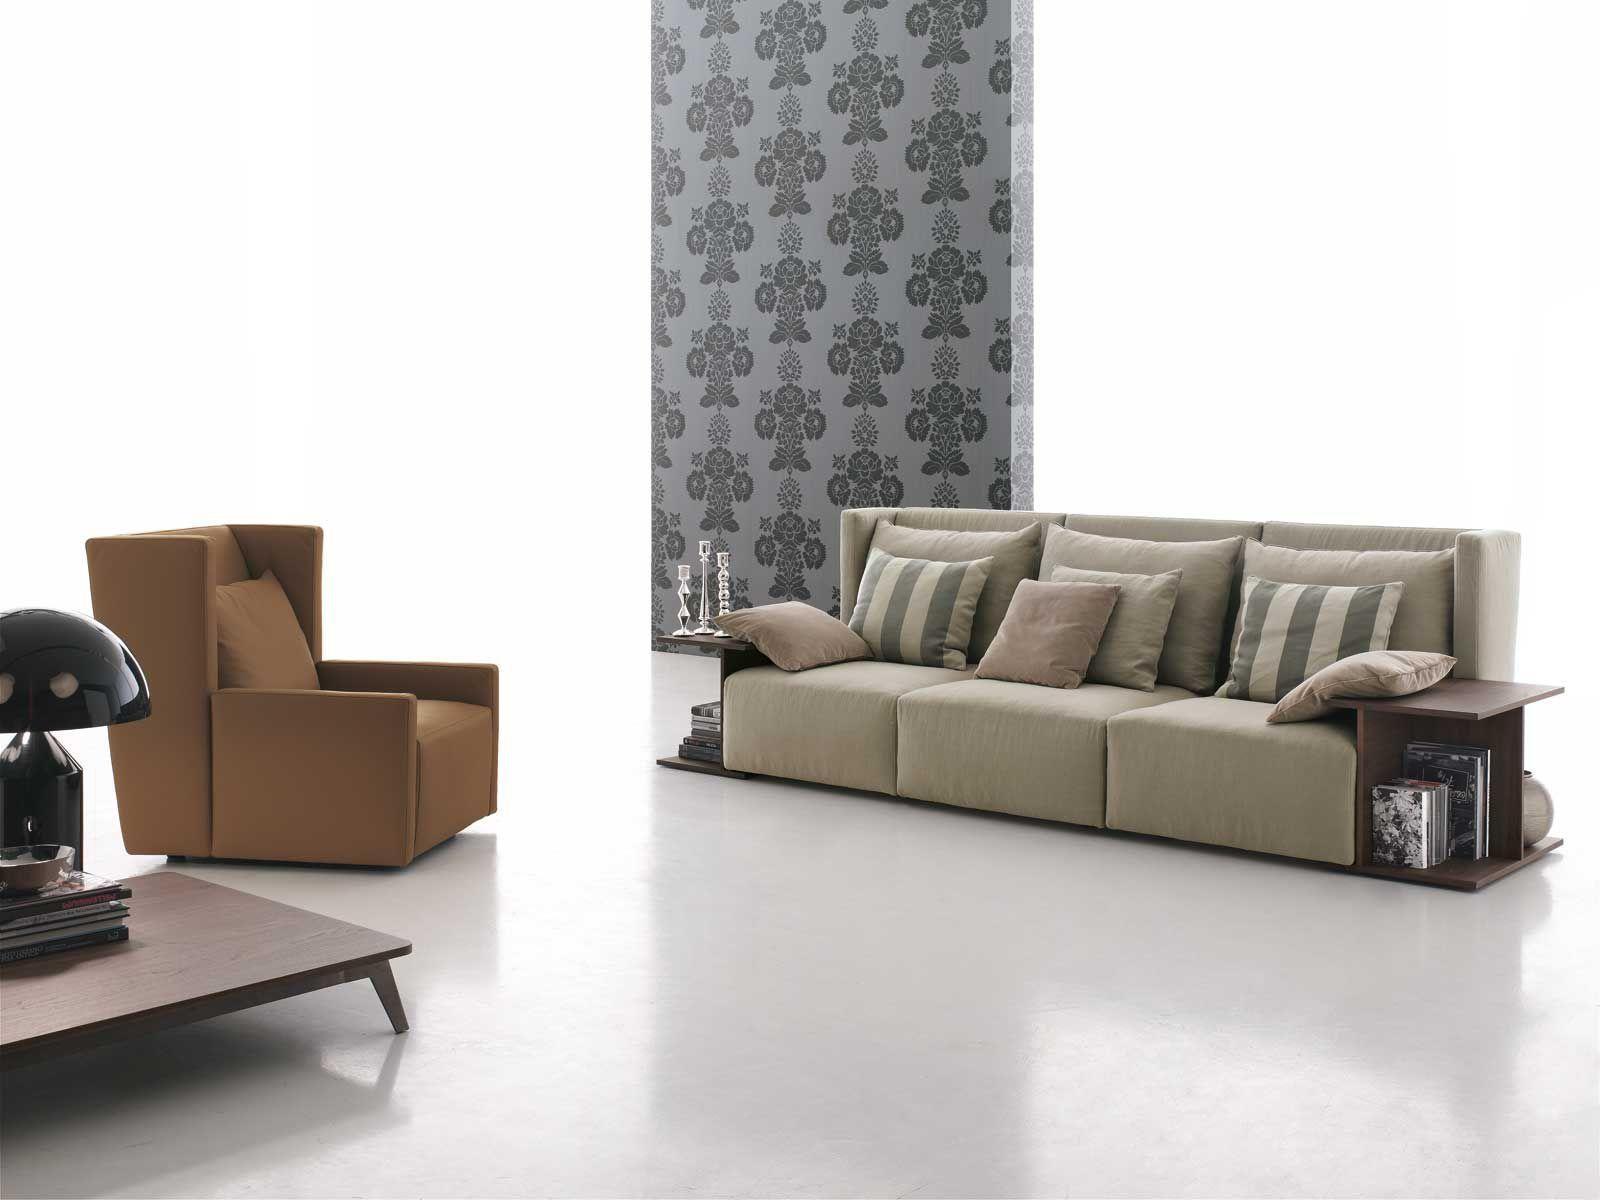 Modular Sofa / Contemporary / Fabric / 3 Seater – Club – Gruppo With Regard To Contemporary Fabric Sofas (View 10 of 20)